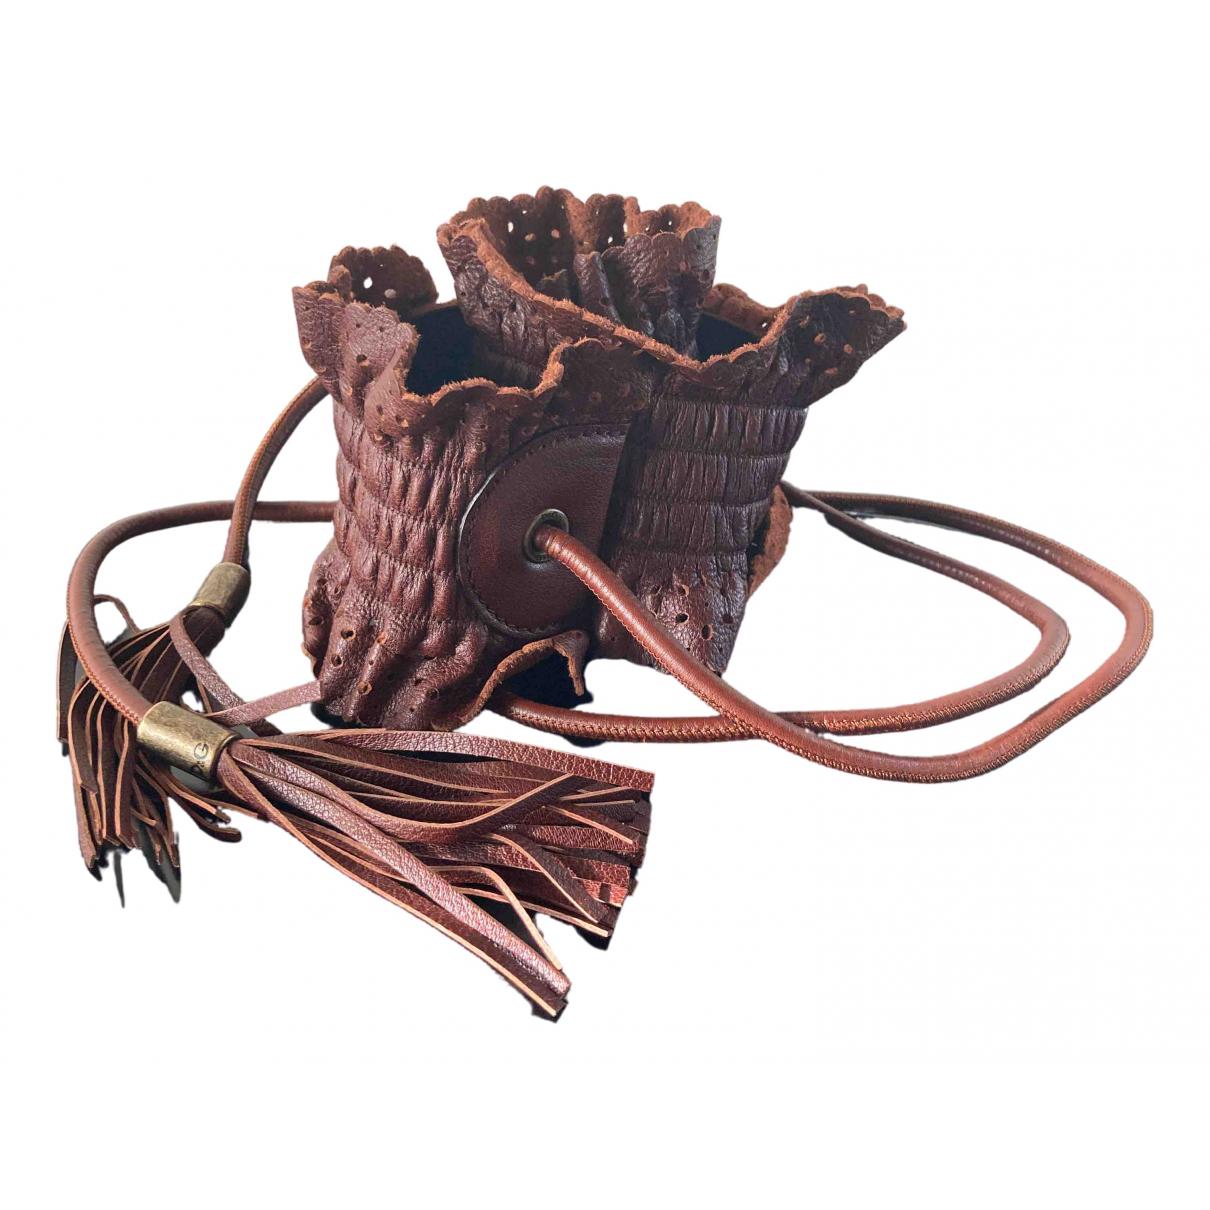 D&g \N Brown Leather belt for Women 70 cm